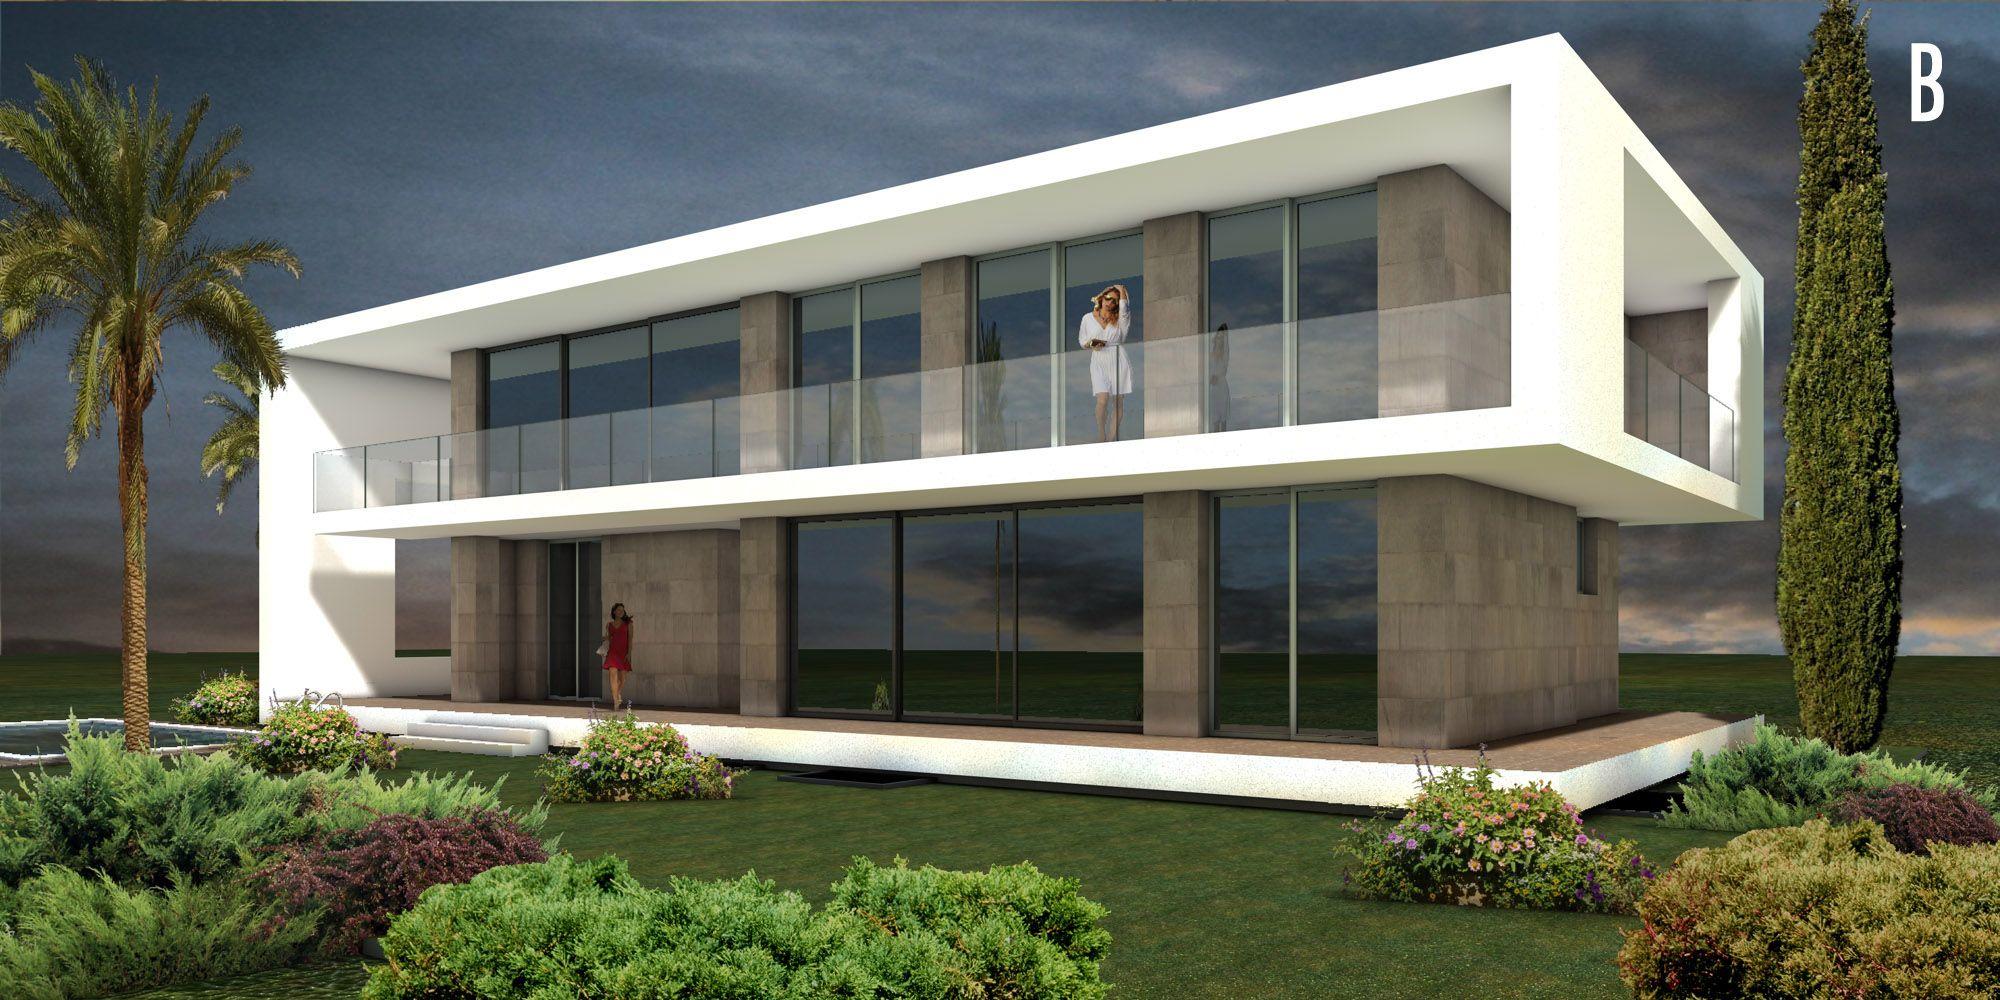 contemporary house by vincenti engineering white architecture pinterest architekten. Black Bedroom Furniture Sets. Home Design Ideas